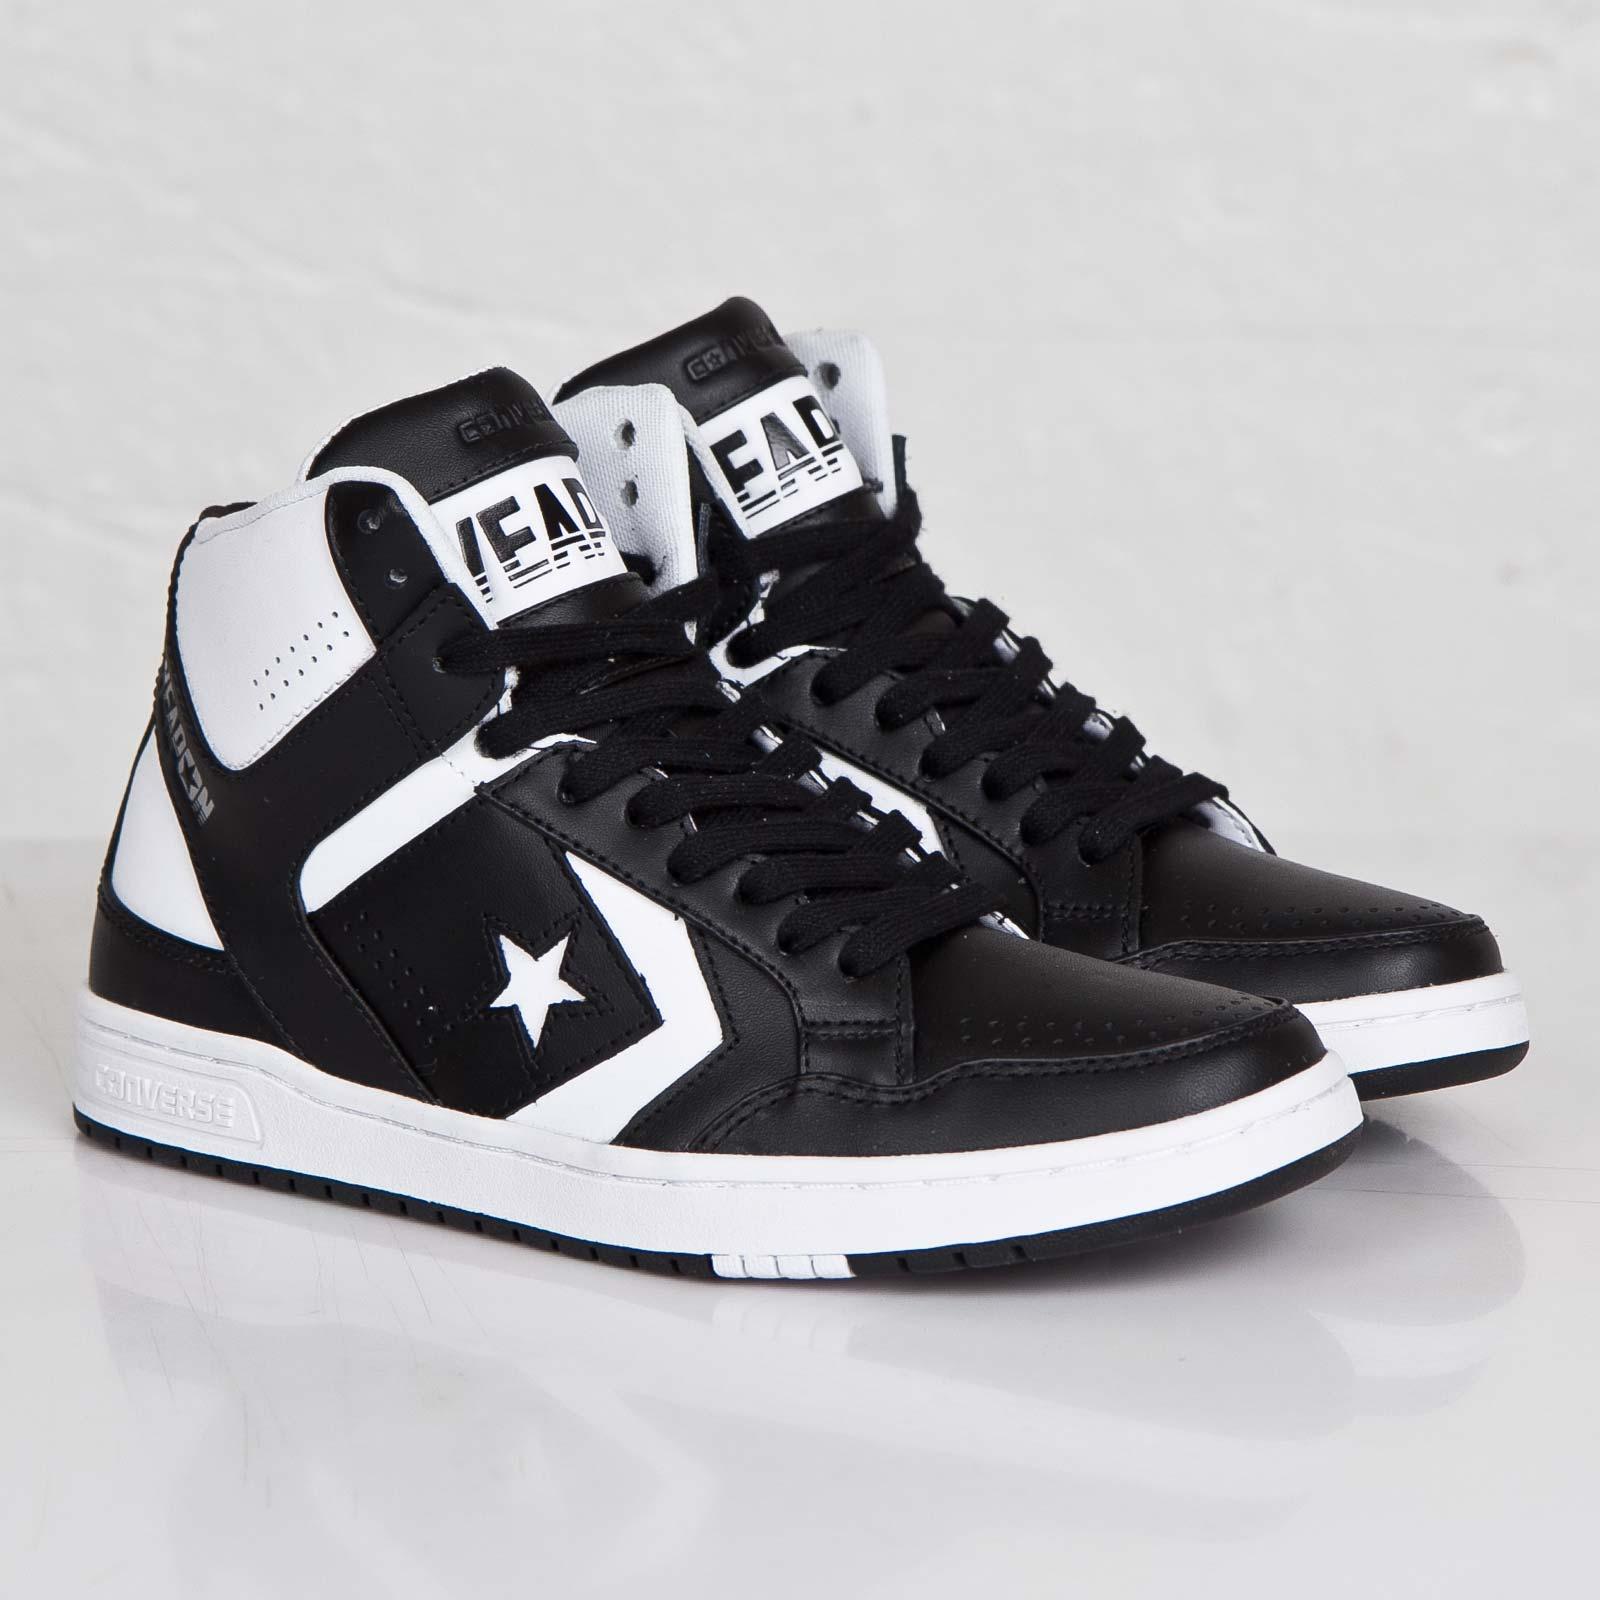 e6bce03fc42 Converse Weapon mid - 144545c - Sneakersnstuff | sneakers ...